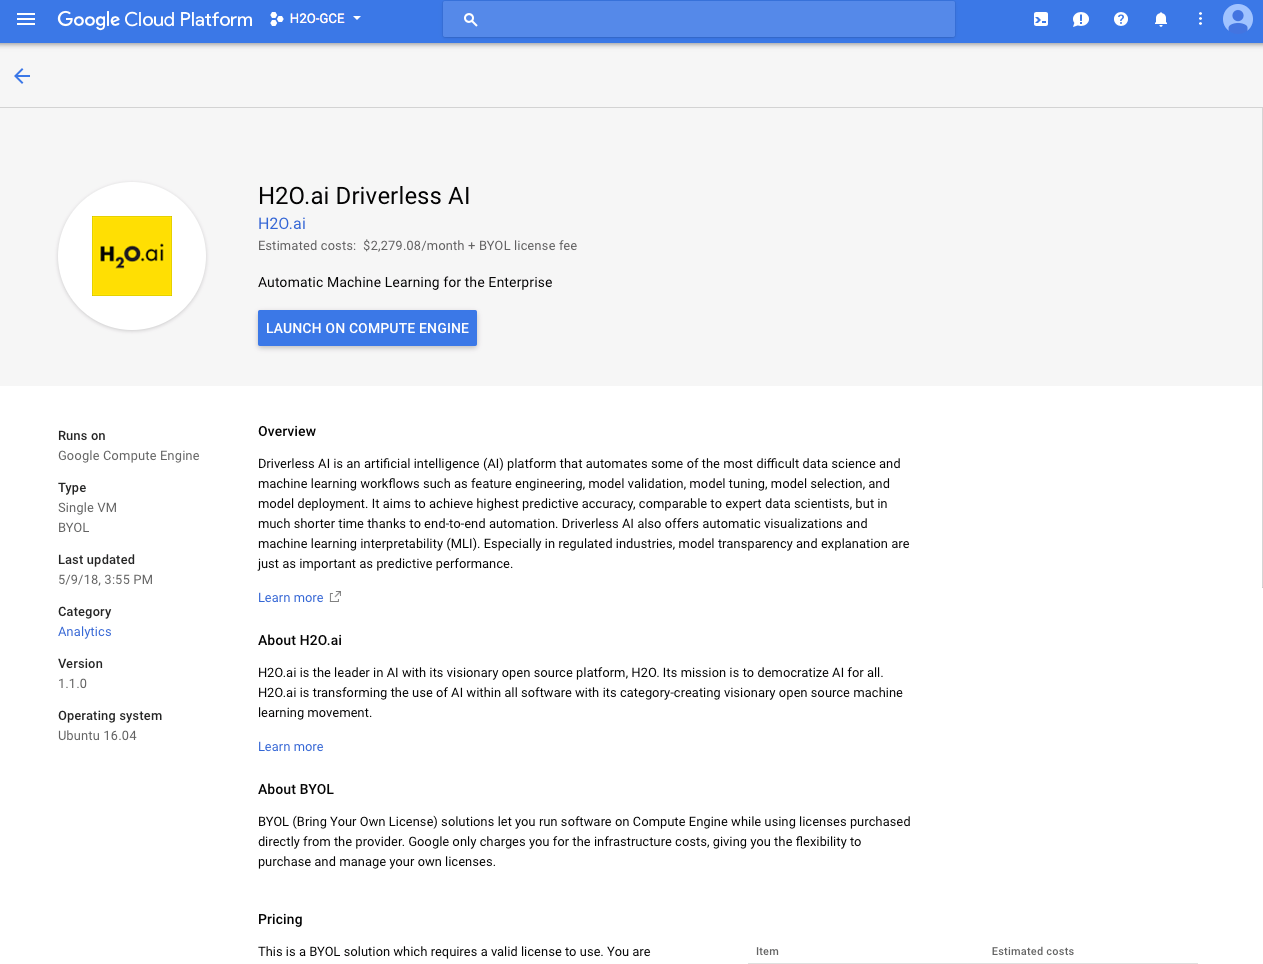 Install the Google Cloud Platform Offering — Using